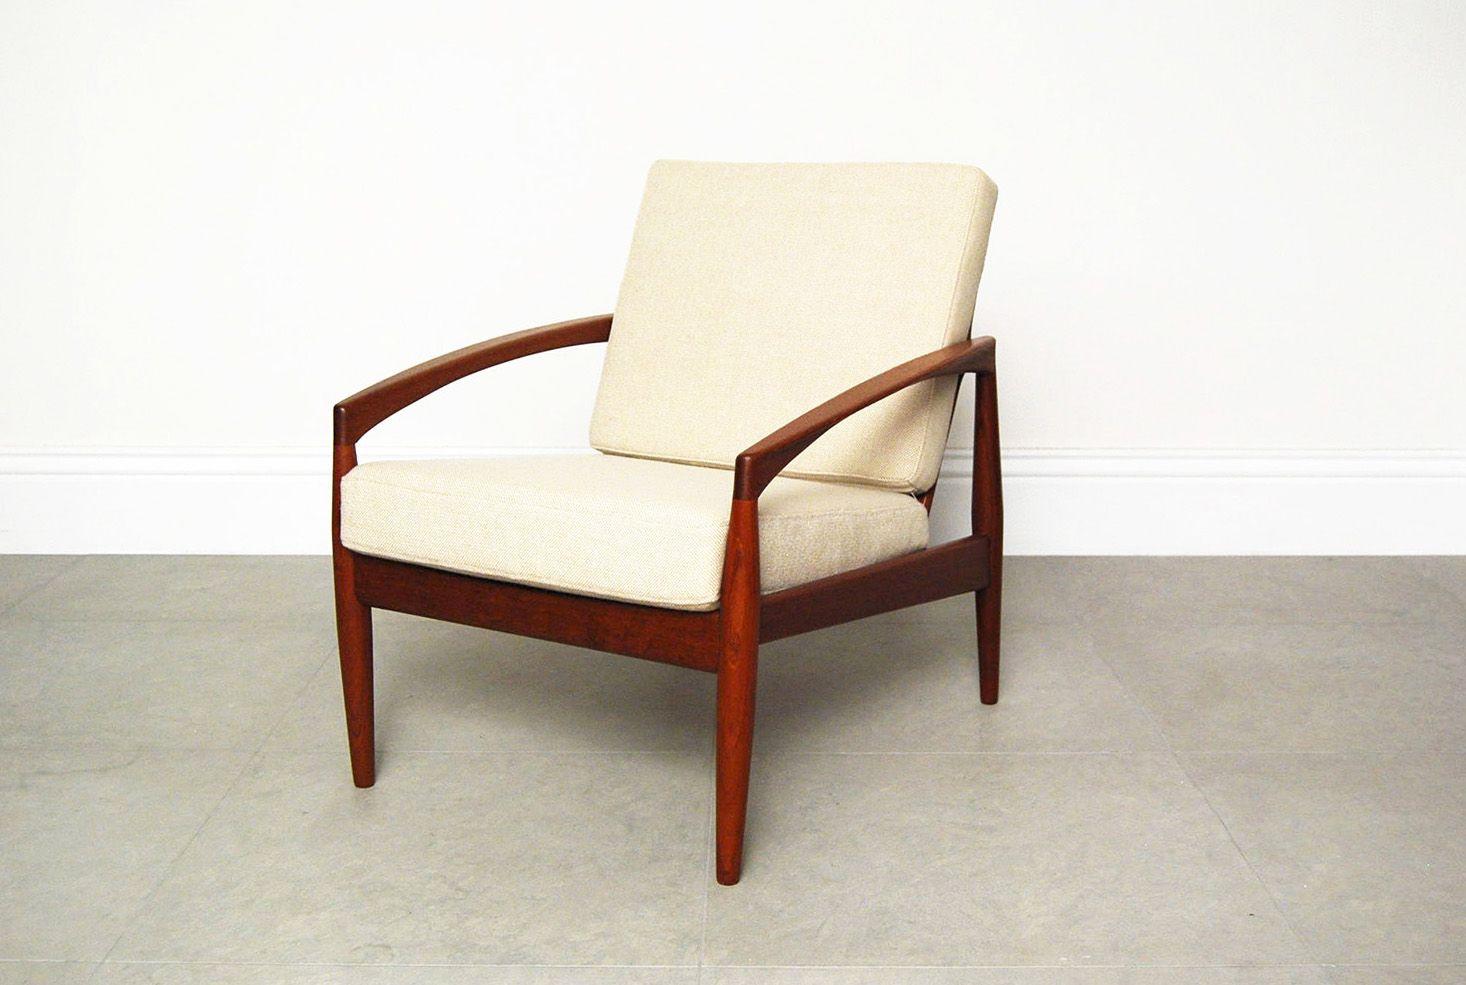 Vintage model 121 paper knife chair by kai kristiansen for sale at pamono - Kai kristiansen chair ...